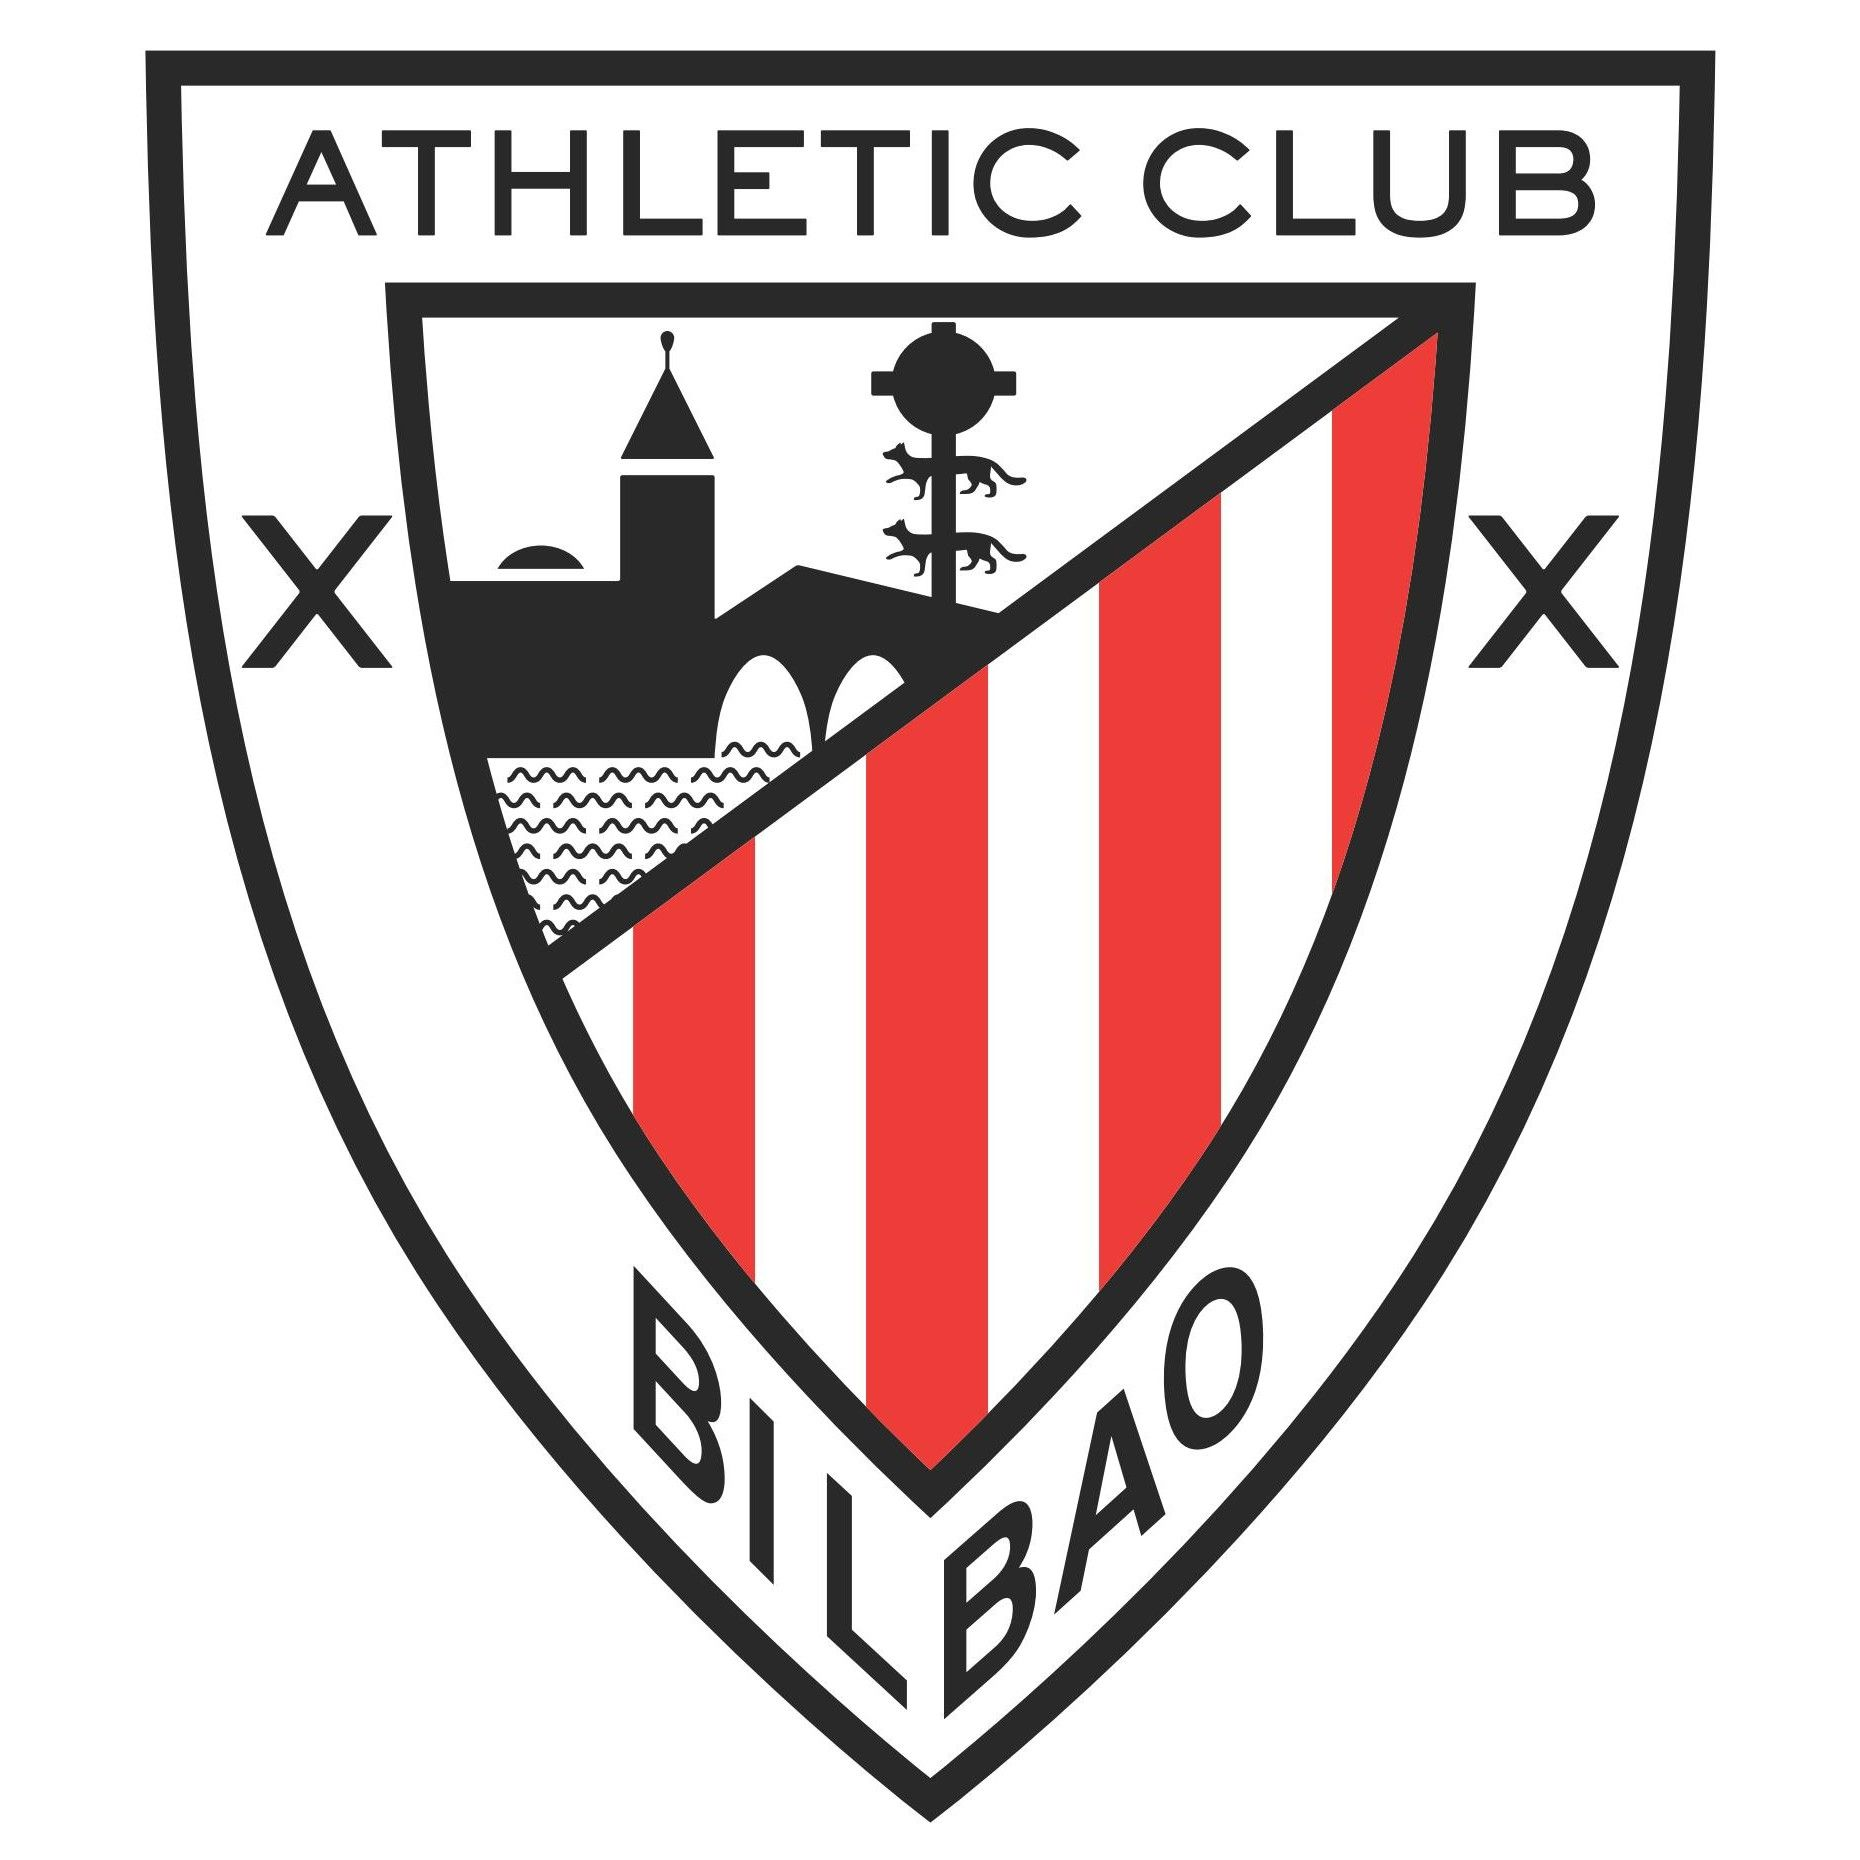 Football/Soccer Logos panosundaki Pin